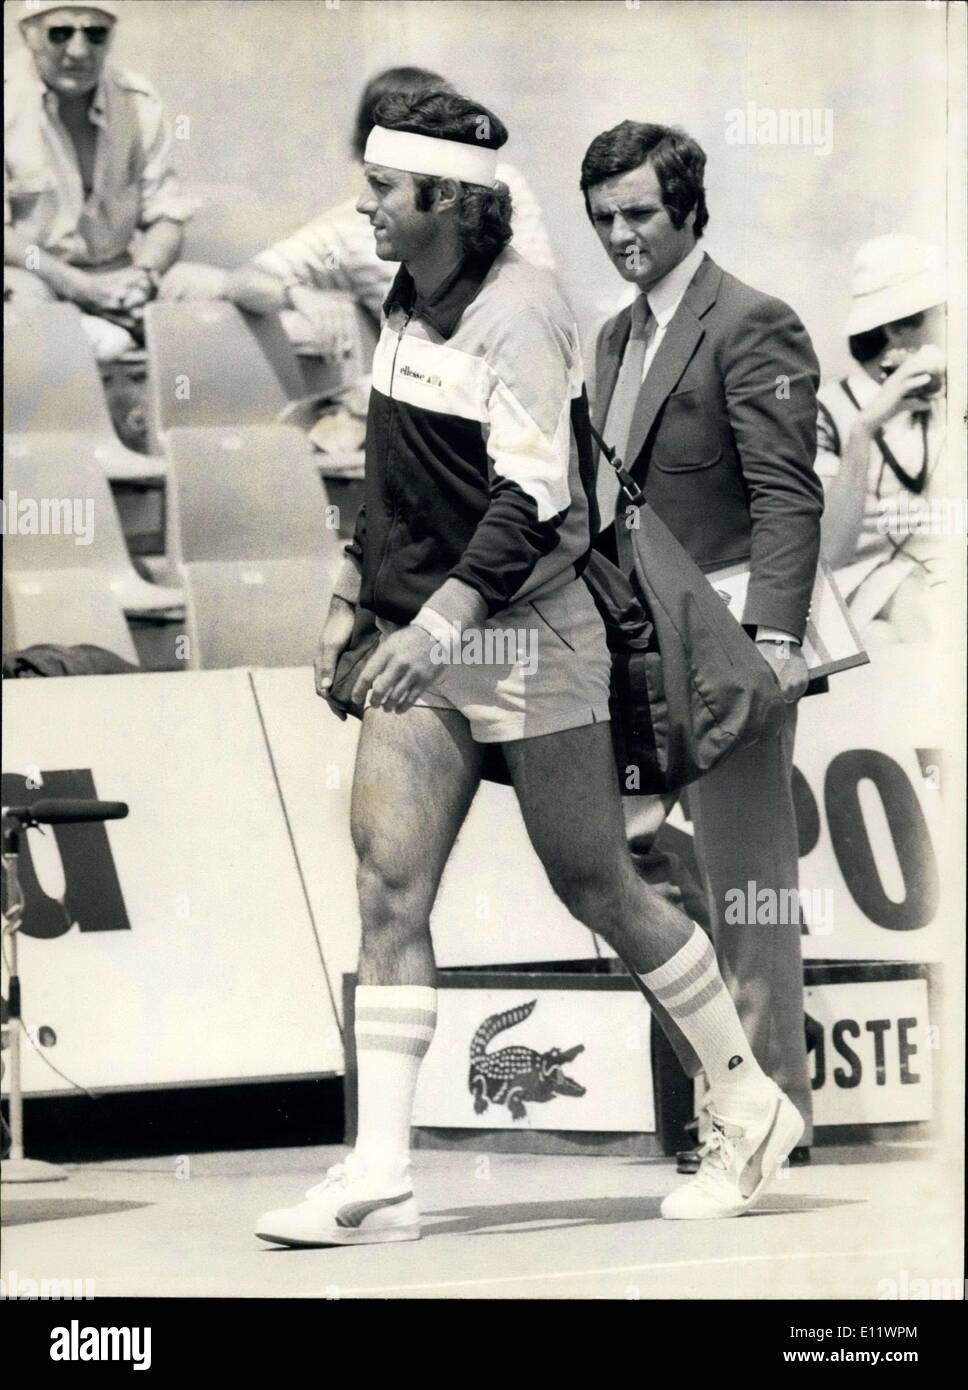 Jun 04 1980 Guillermo Villas Argentina won his match against